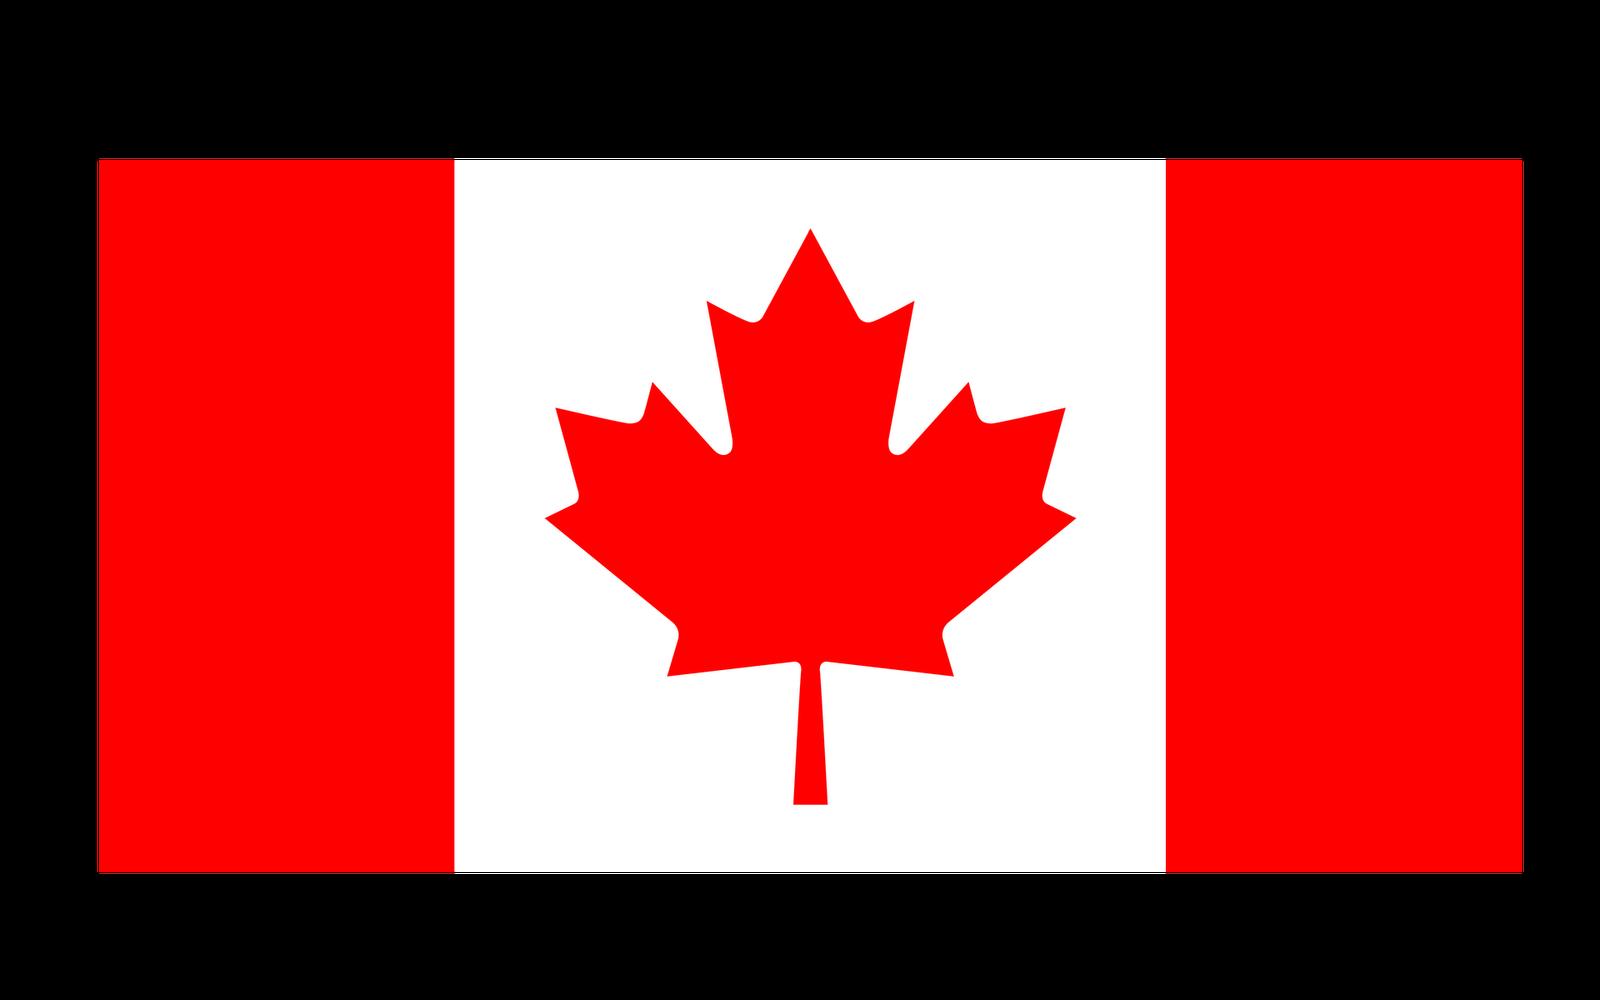 Canada Flag Hd Wallpaper Hd Images Of Canada Flag 283875